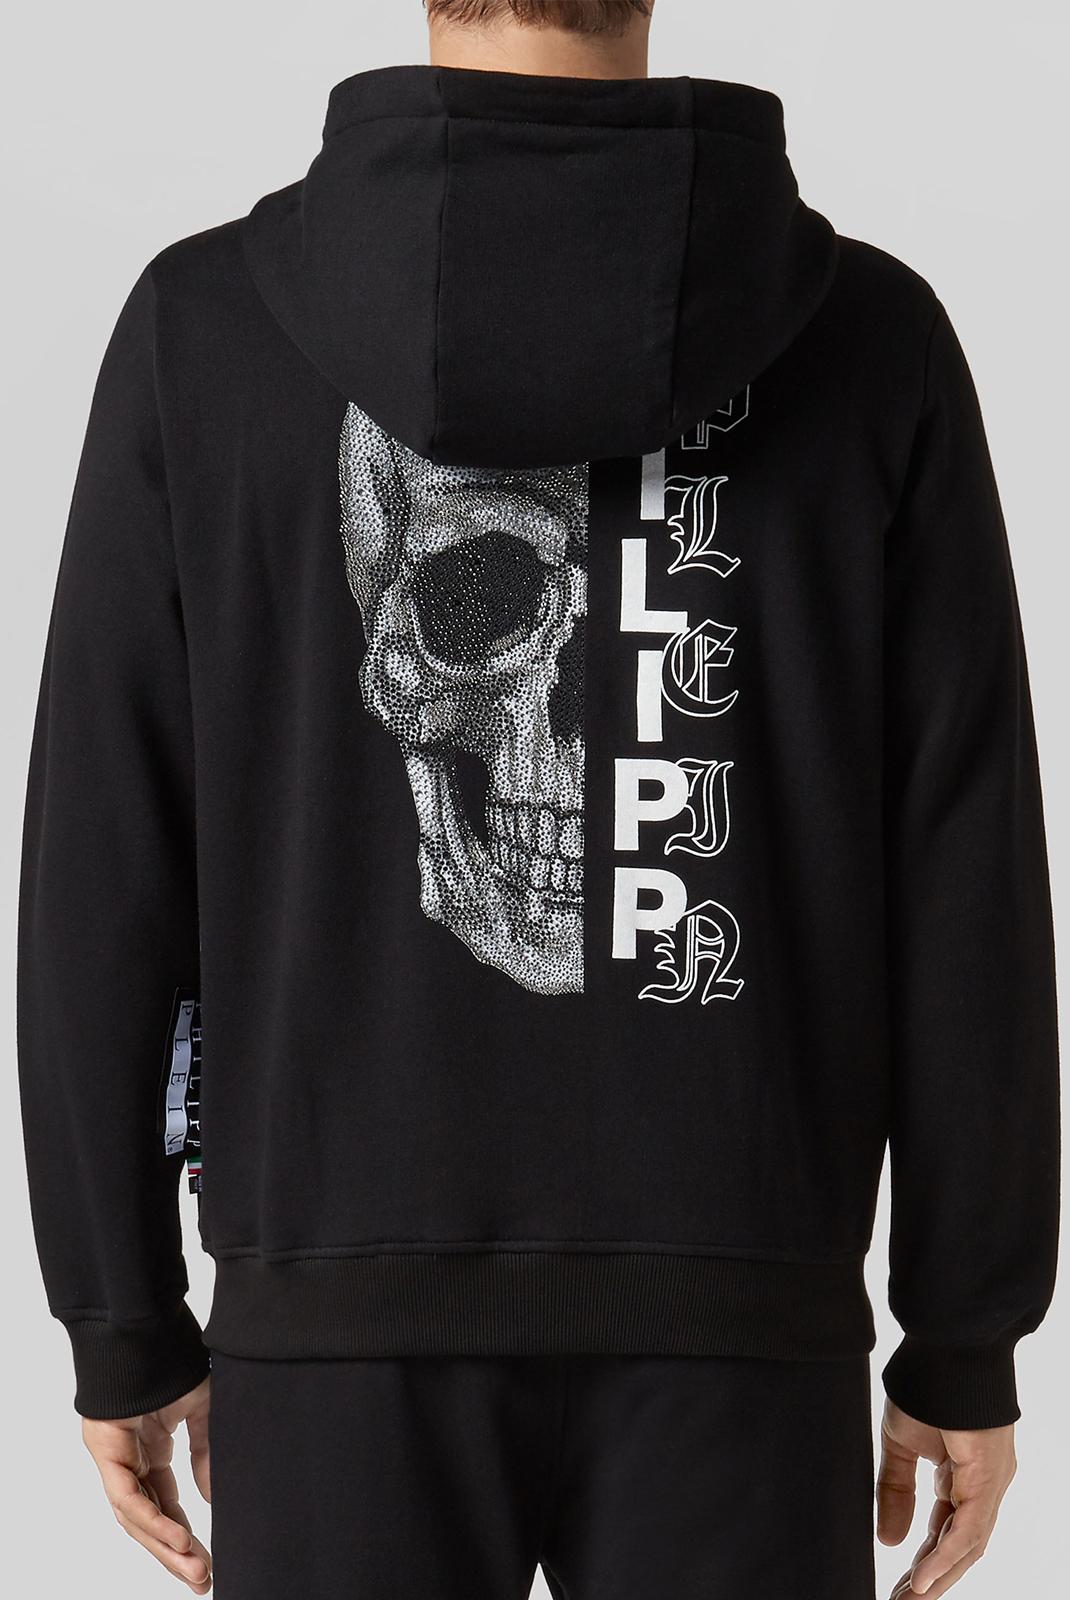 Vestes zippées  Philipp plein MJB0959 BLACK